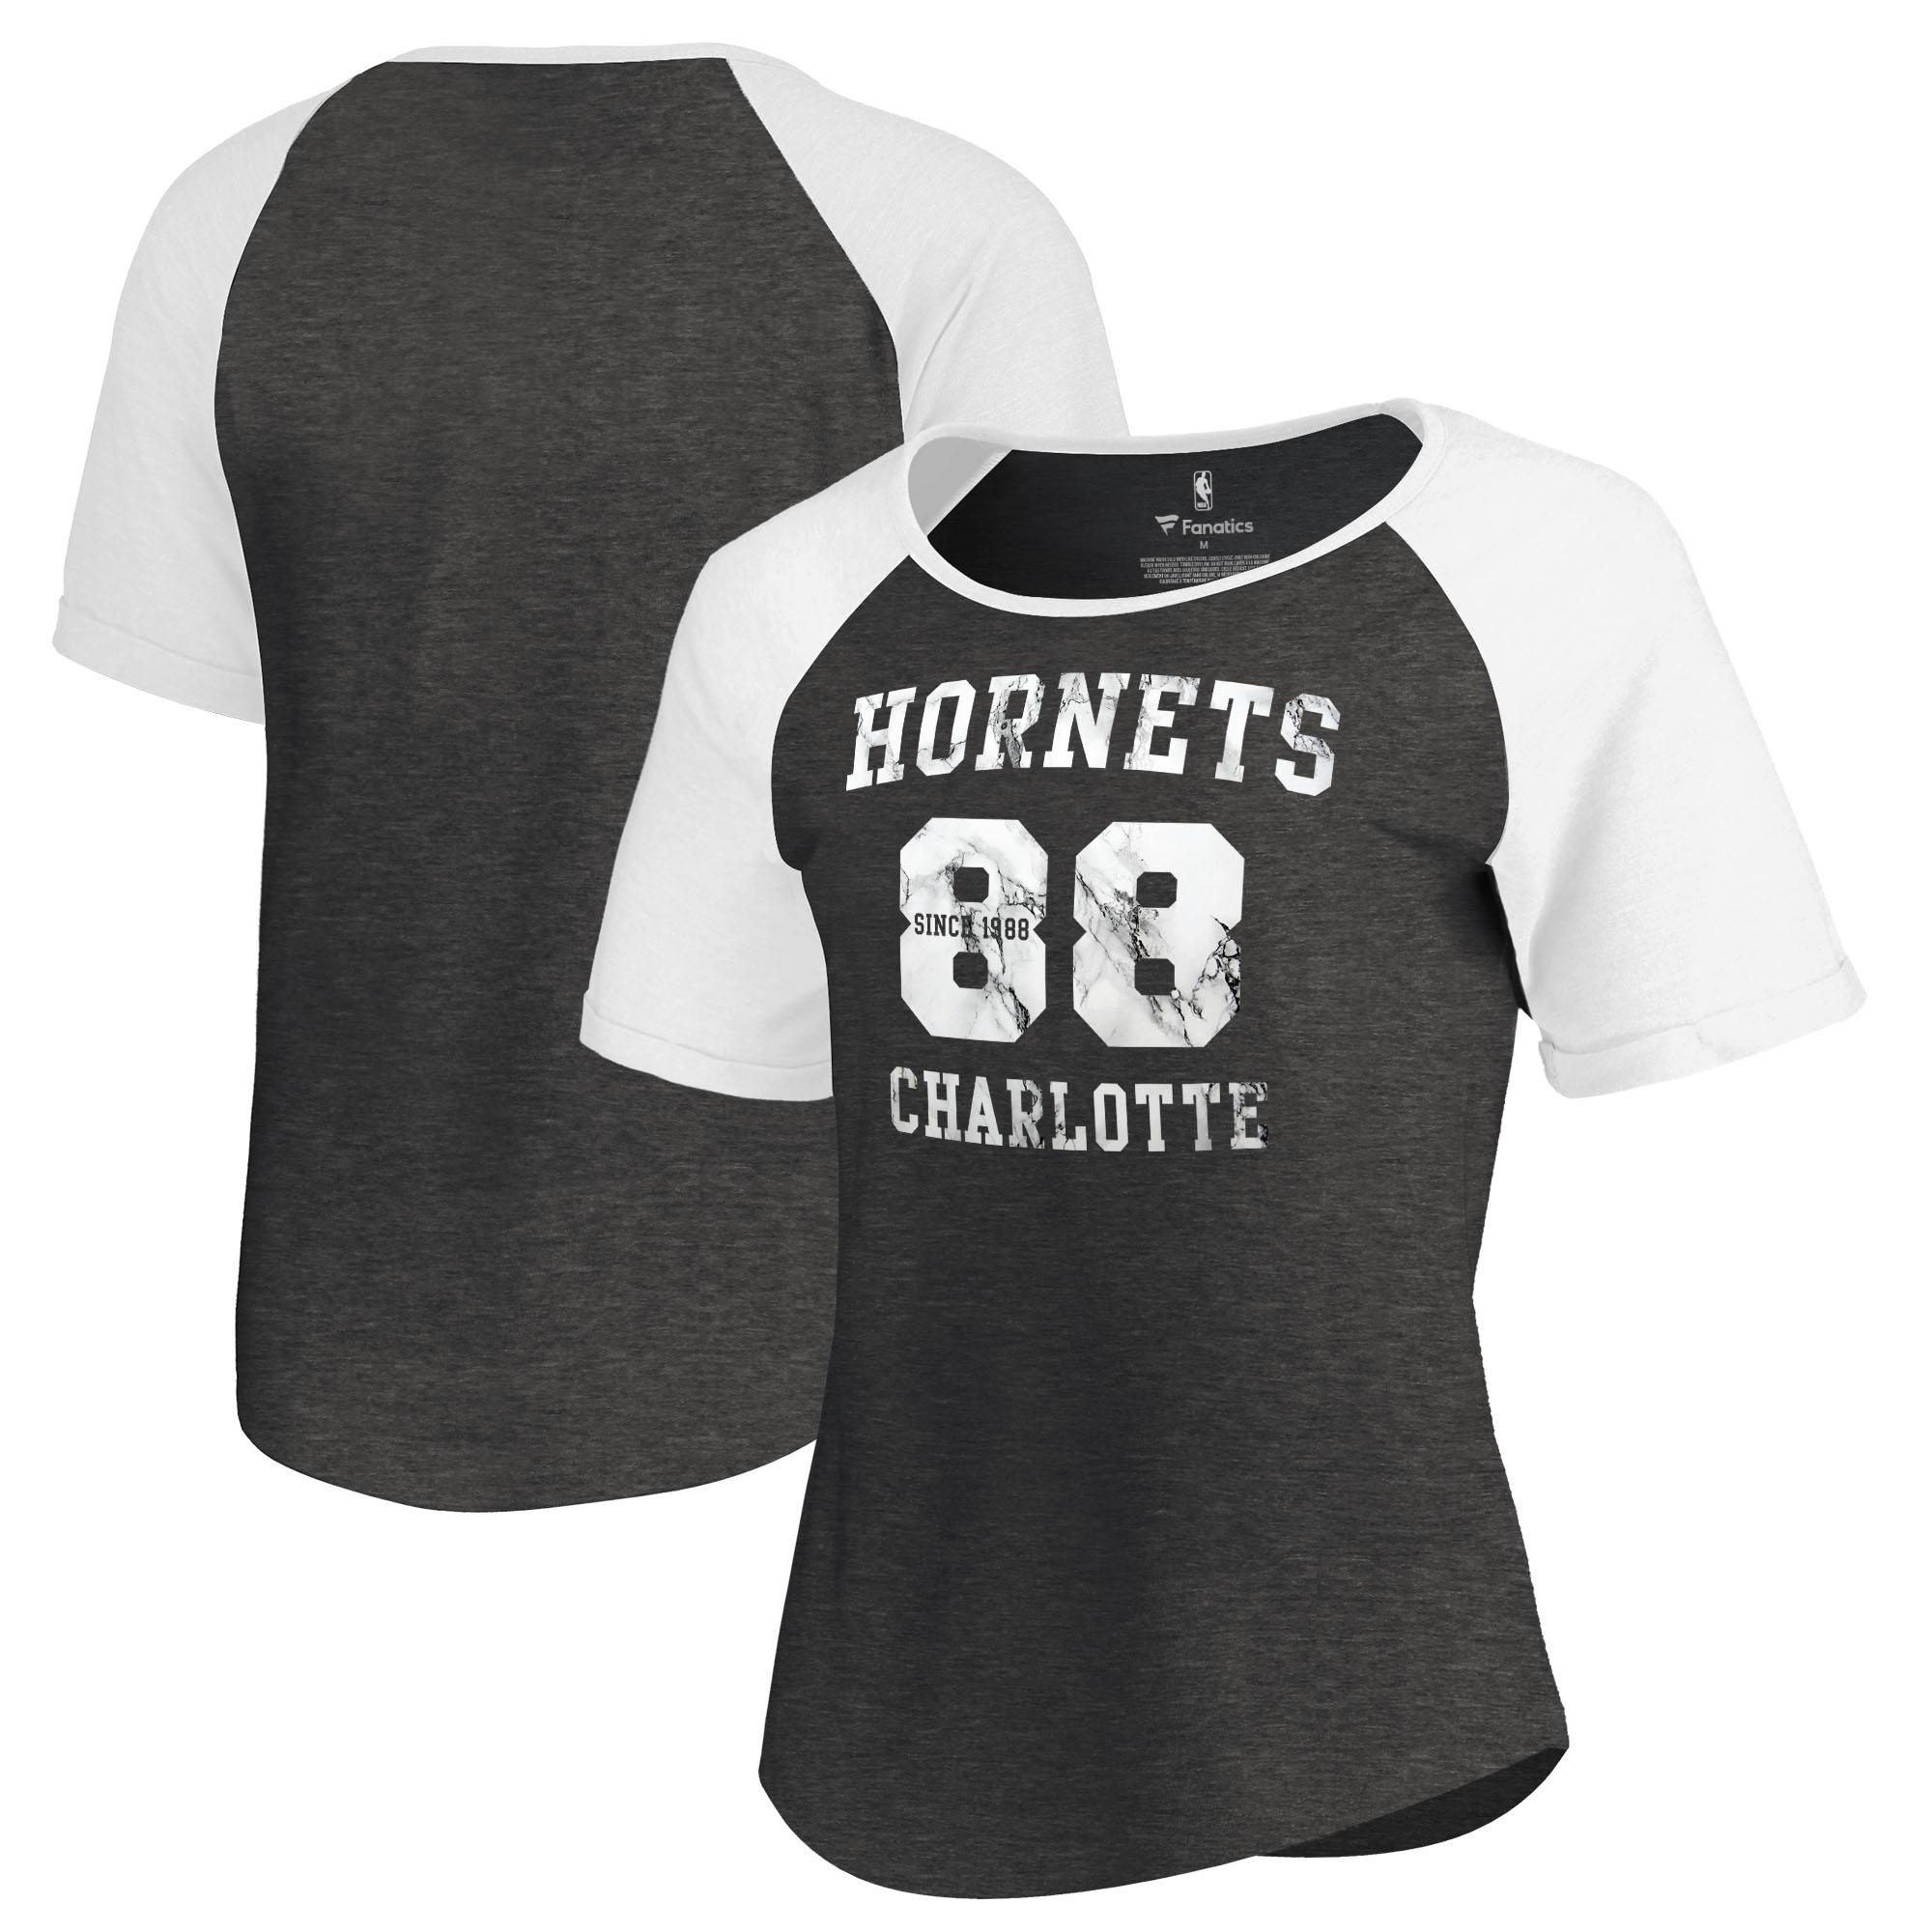 Charlotte Hornets Fanatics Branded Women's Hang Time Short Sleeve Raglan T-Shirt - Black